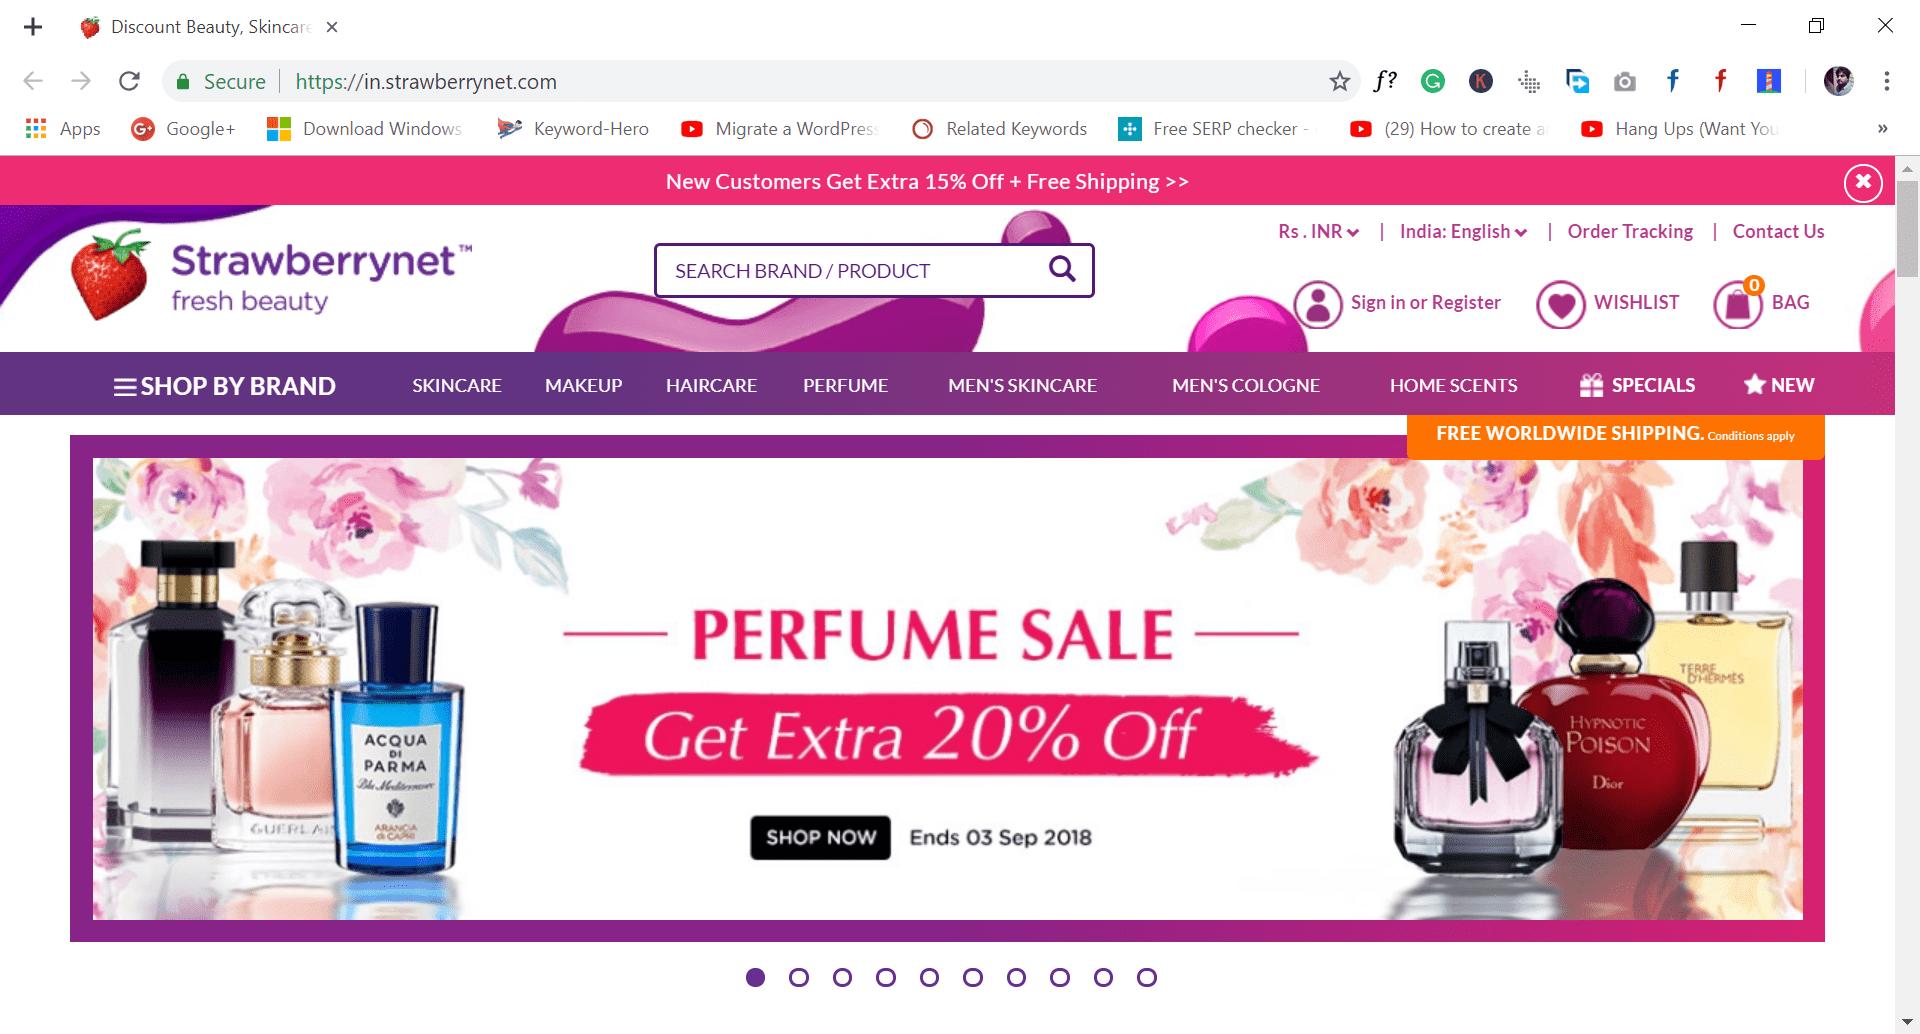 strawberrynet - site like wish.com